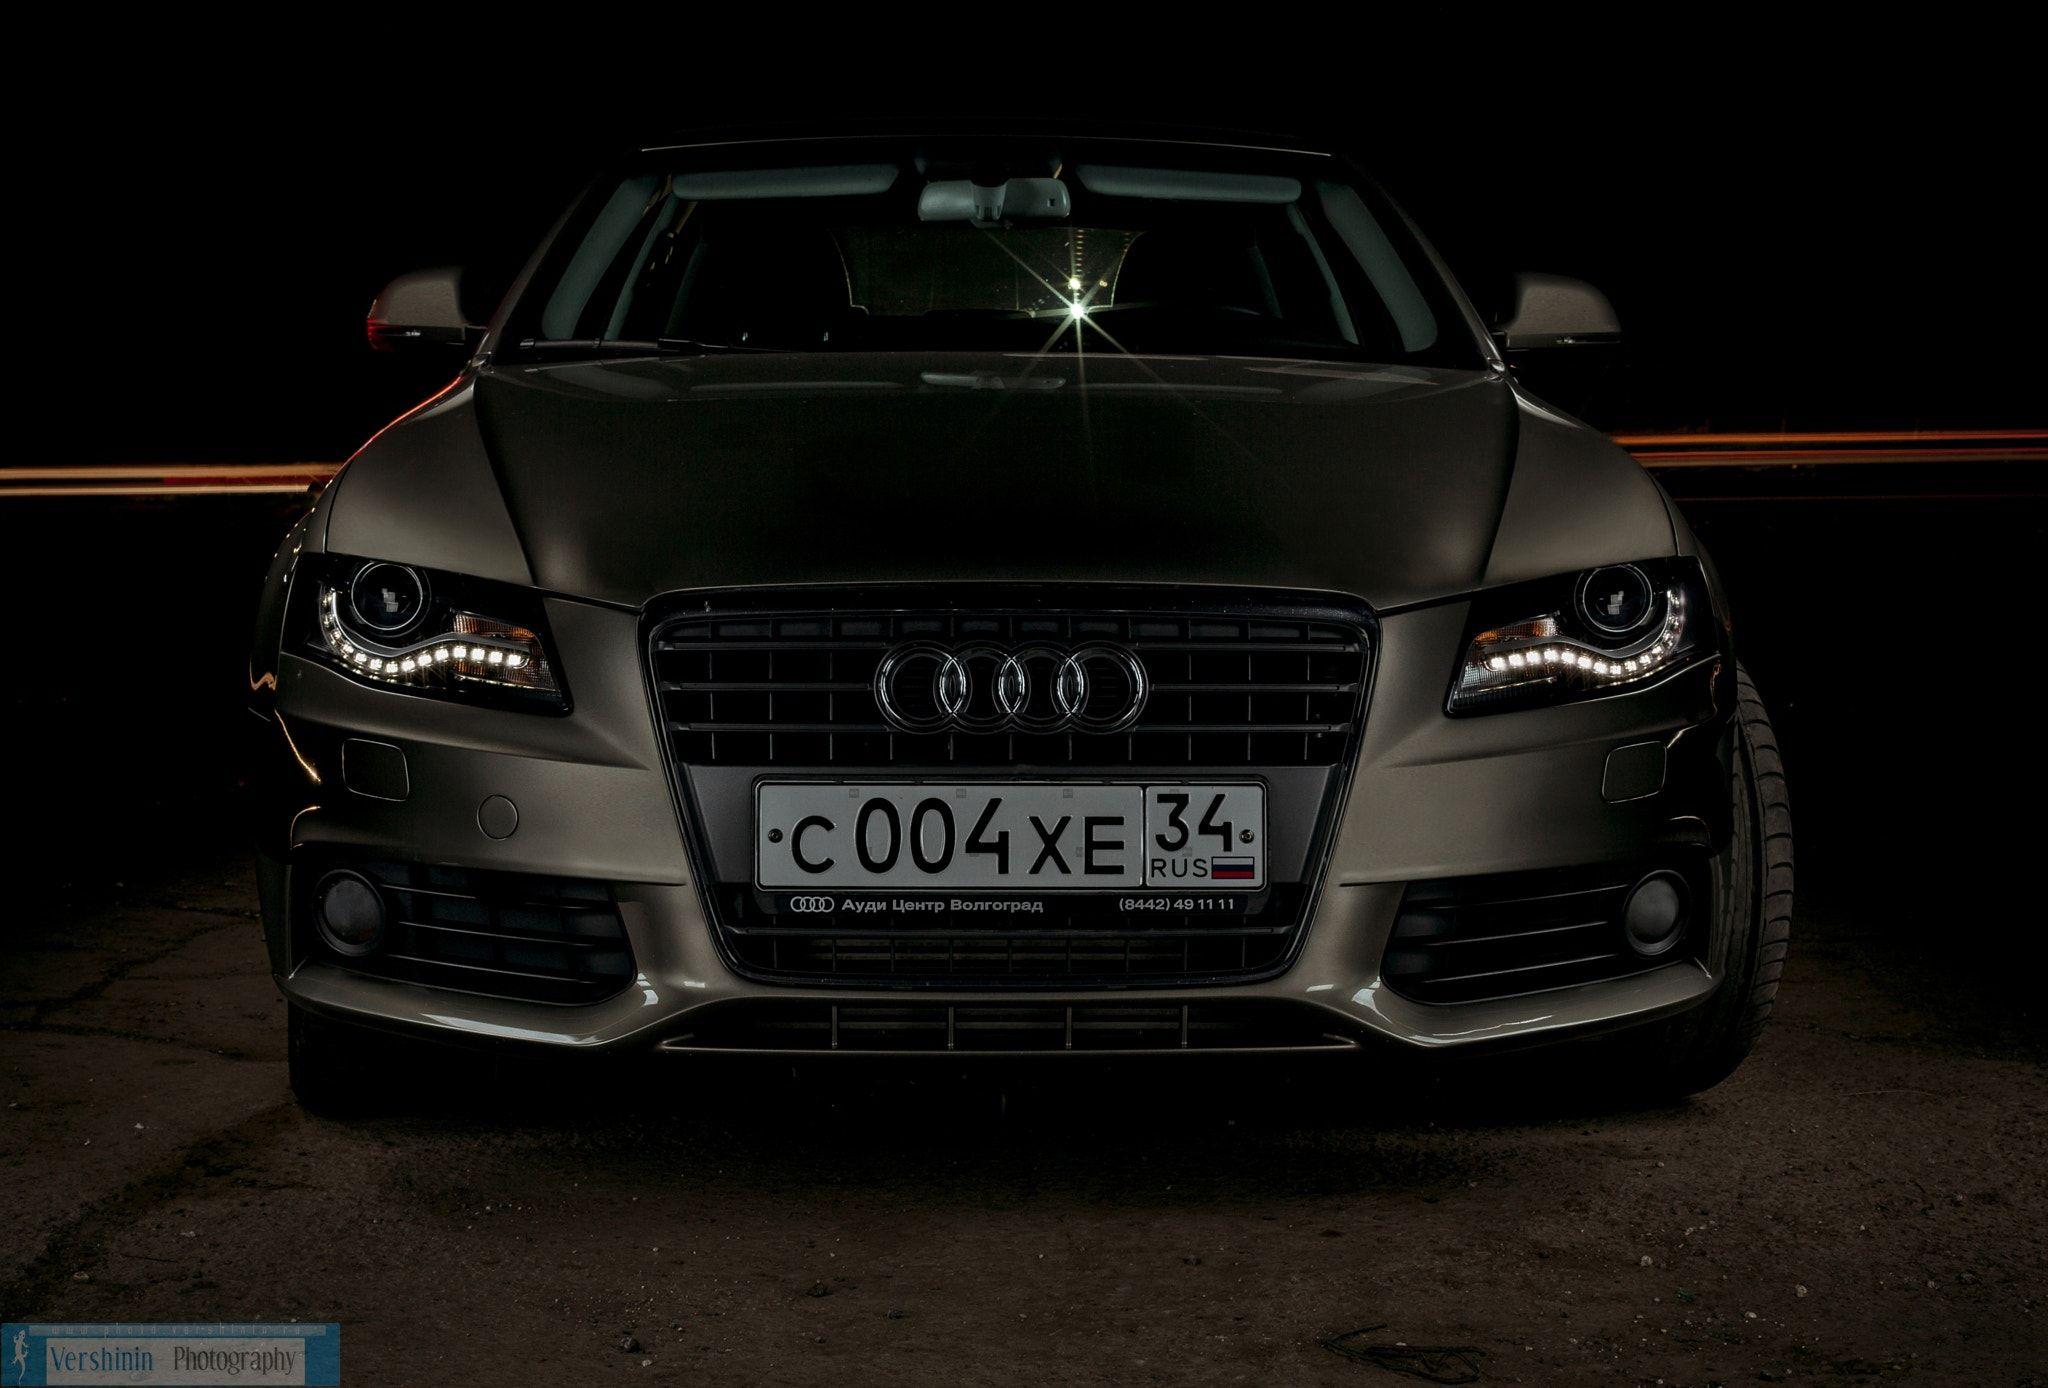 Audi A4 1.8T - cool car